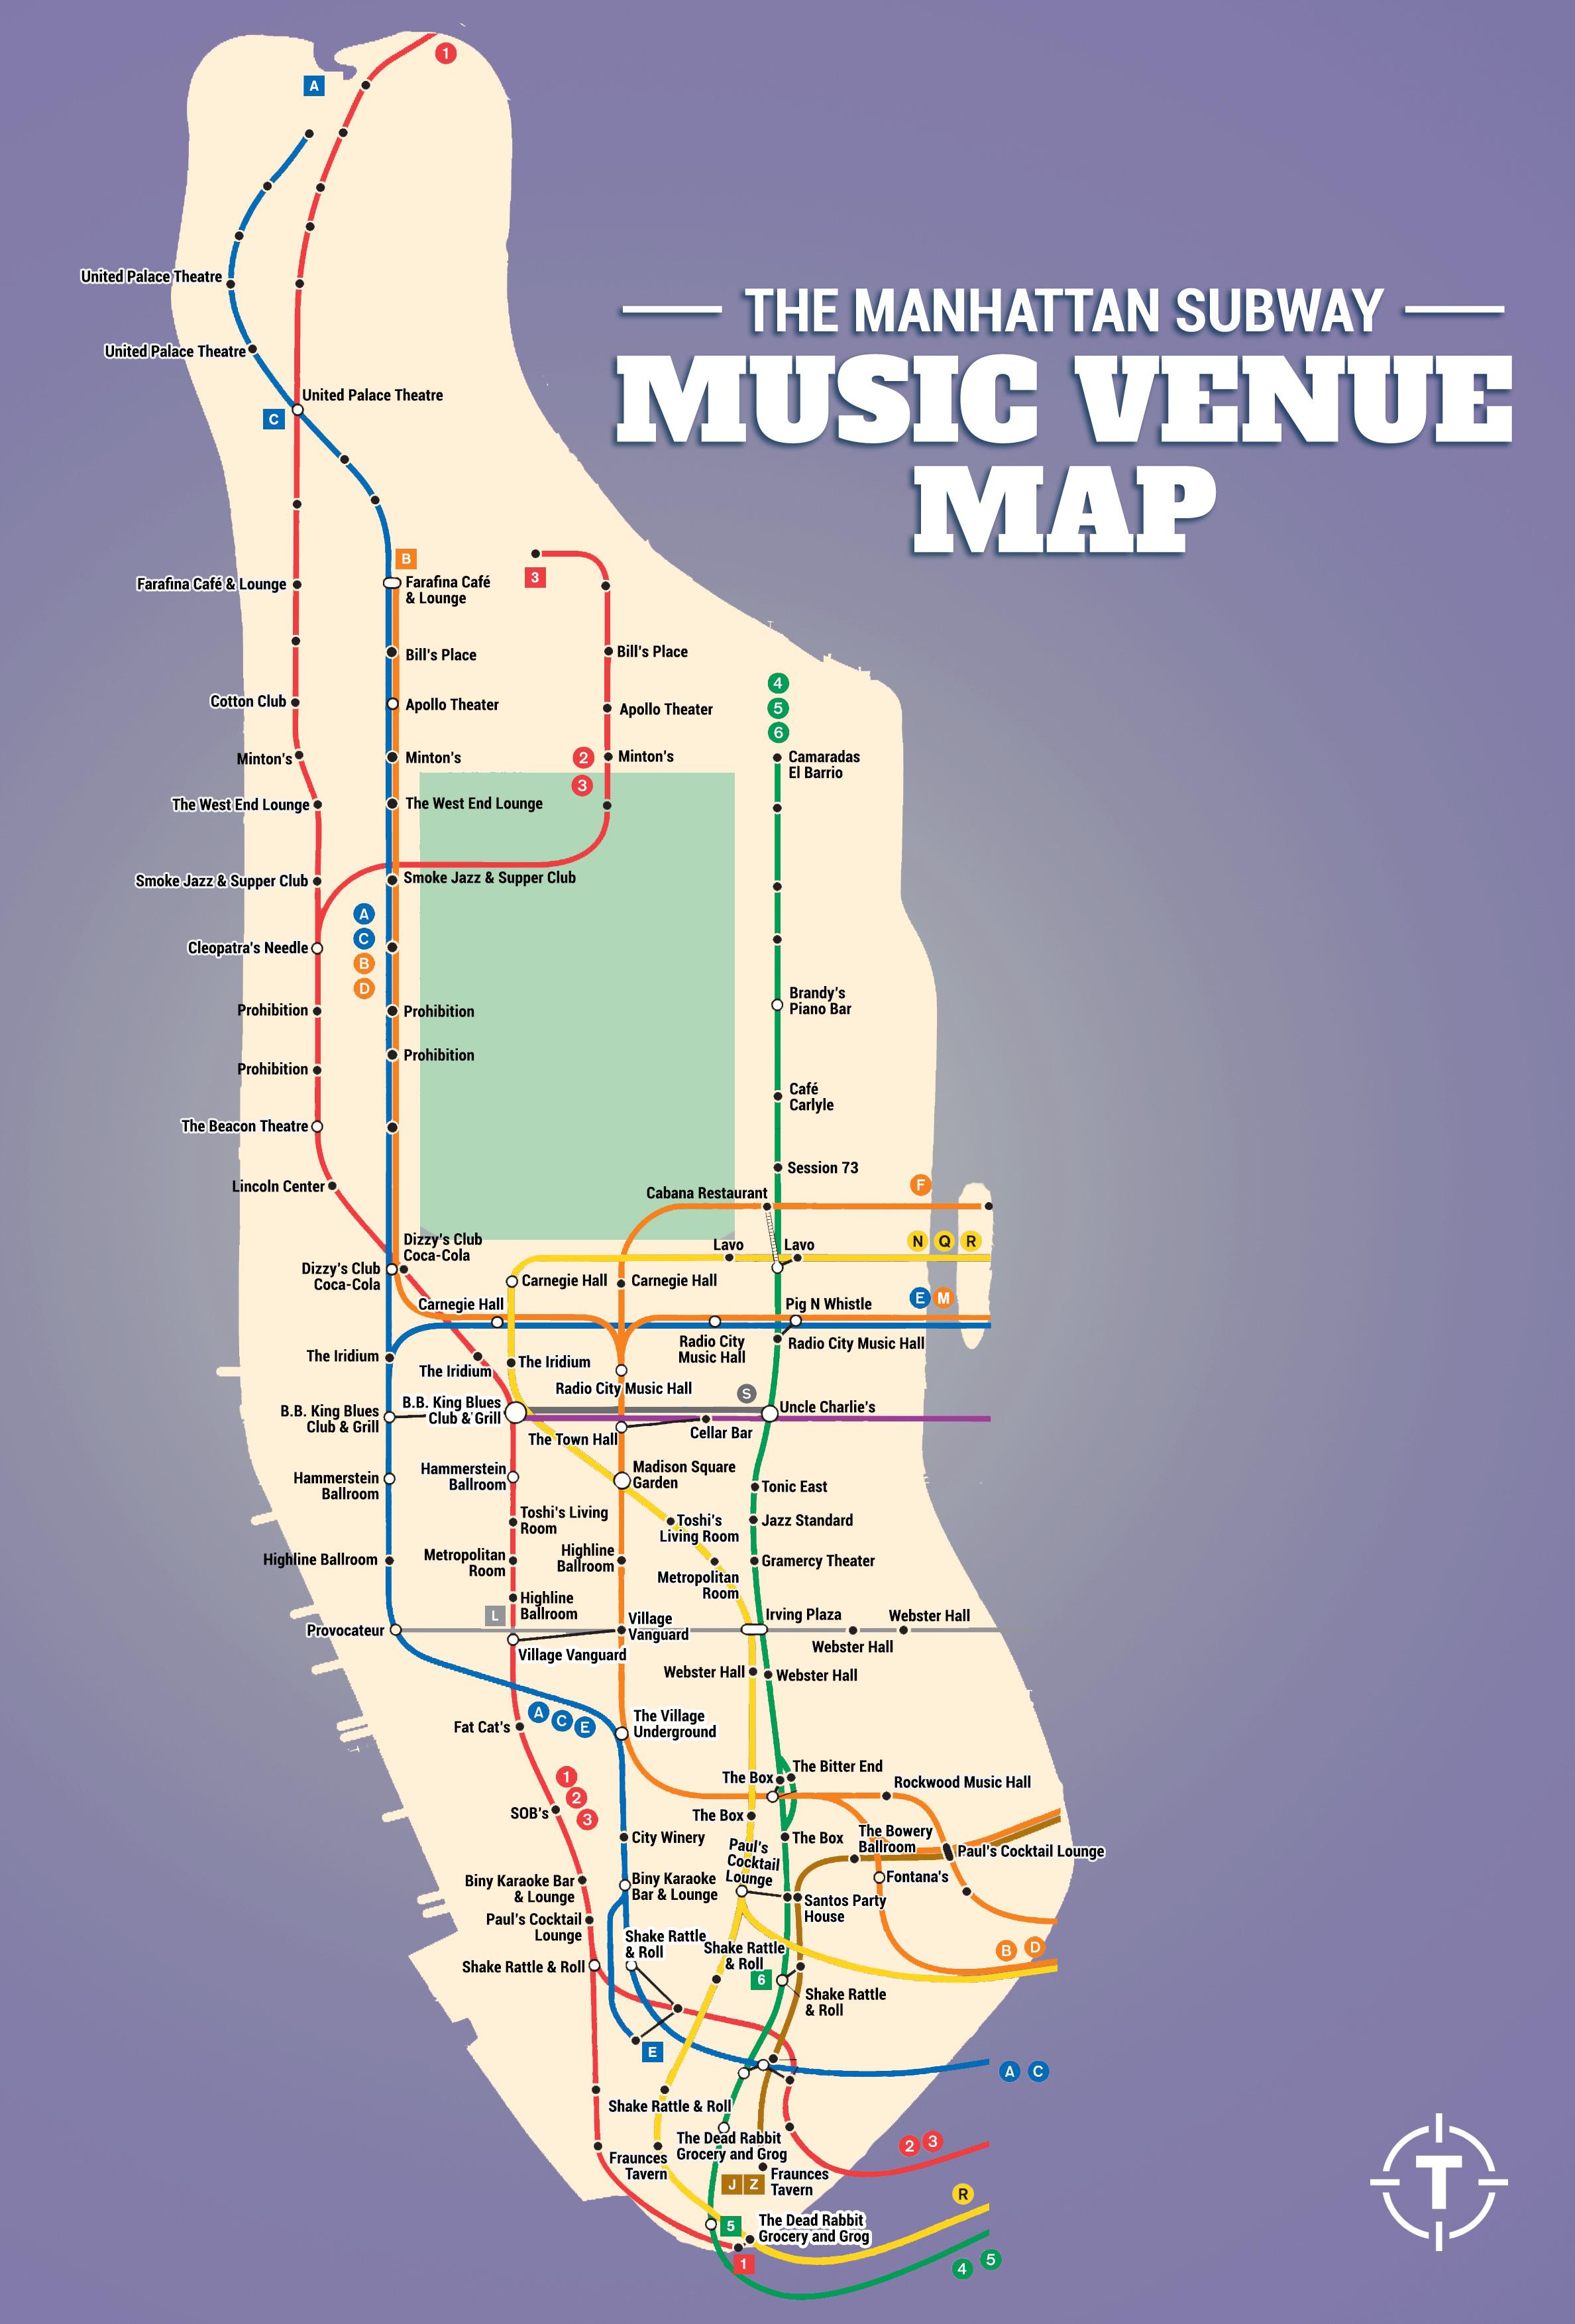 Subway Map Live.The Manhattan Subway Music Venue Map Thrillist